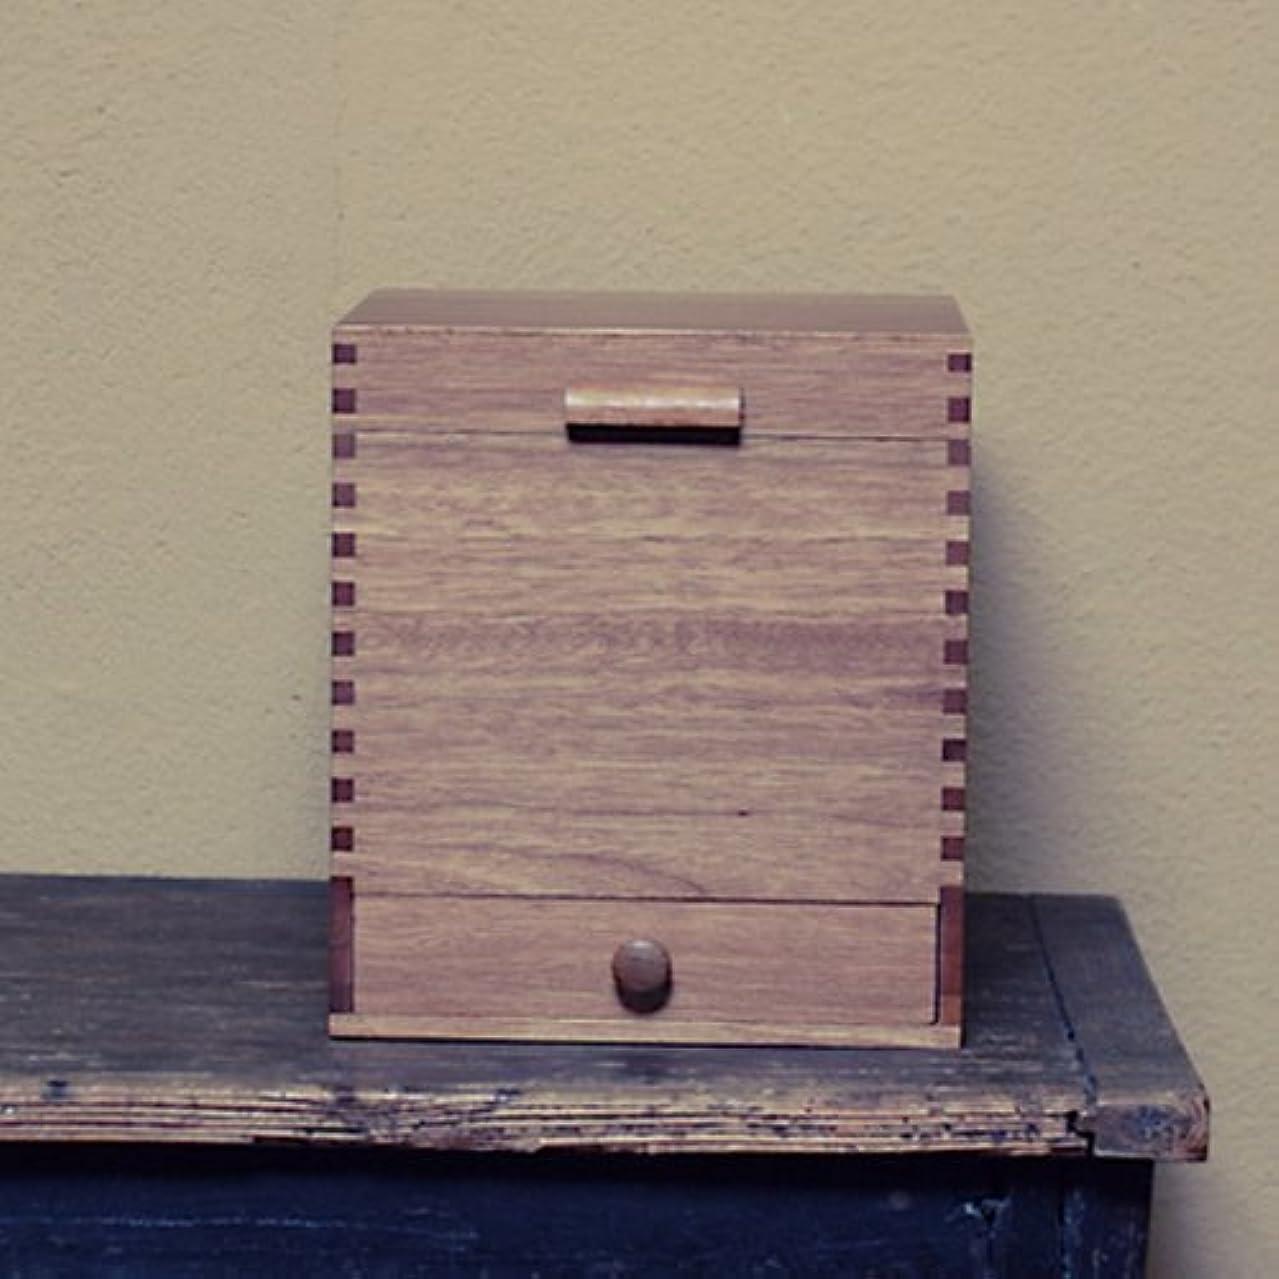 通知入り口情緒的倉敷意匠計画室 化粧ボックス